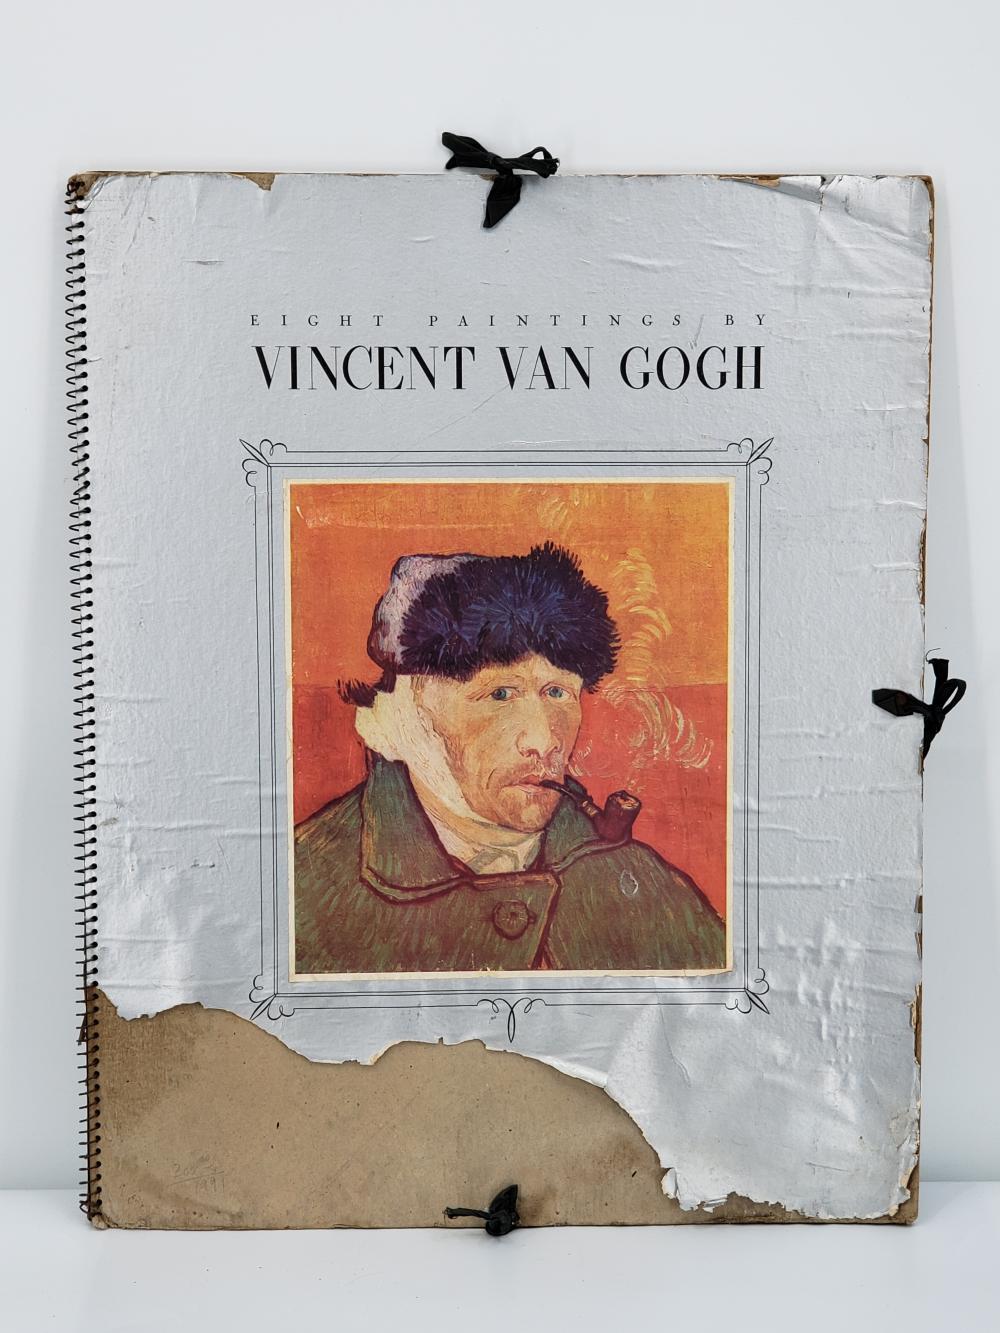 VINCENT VAN GOGH PORTFOLIO OF PRINTS